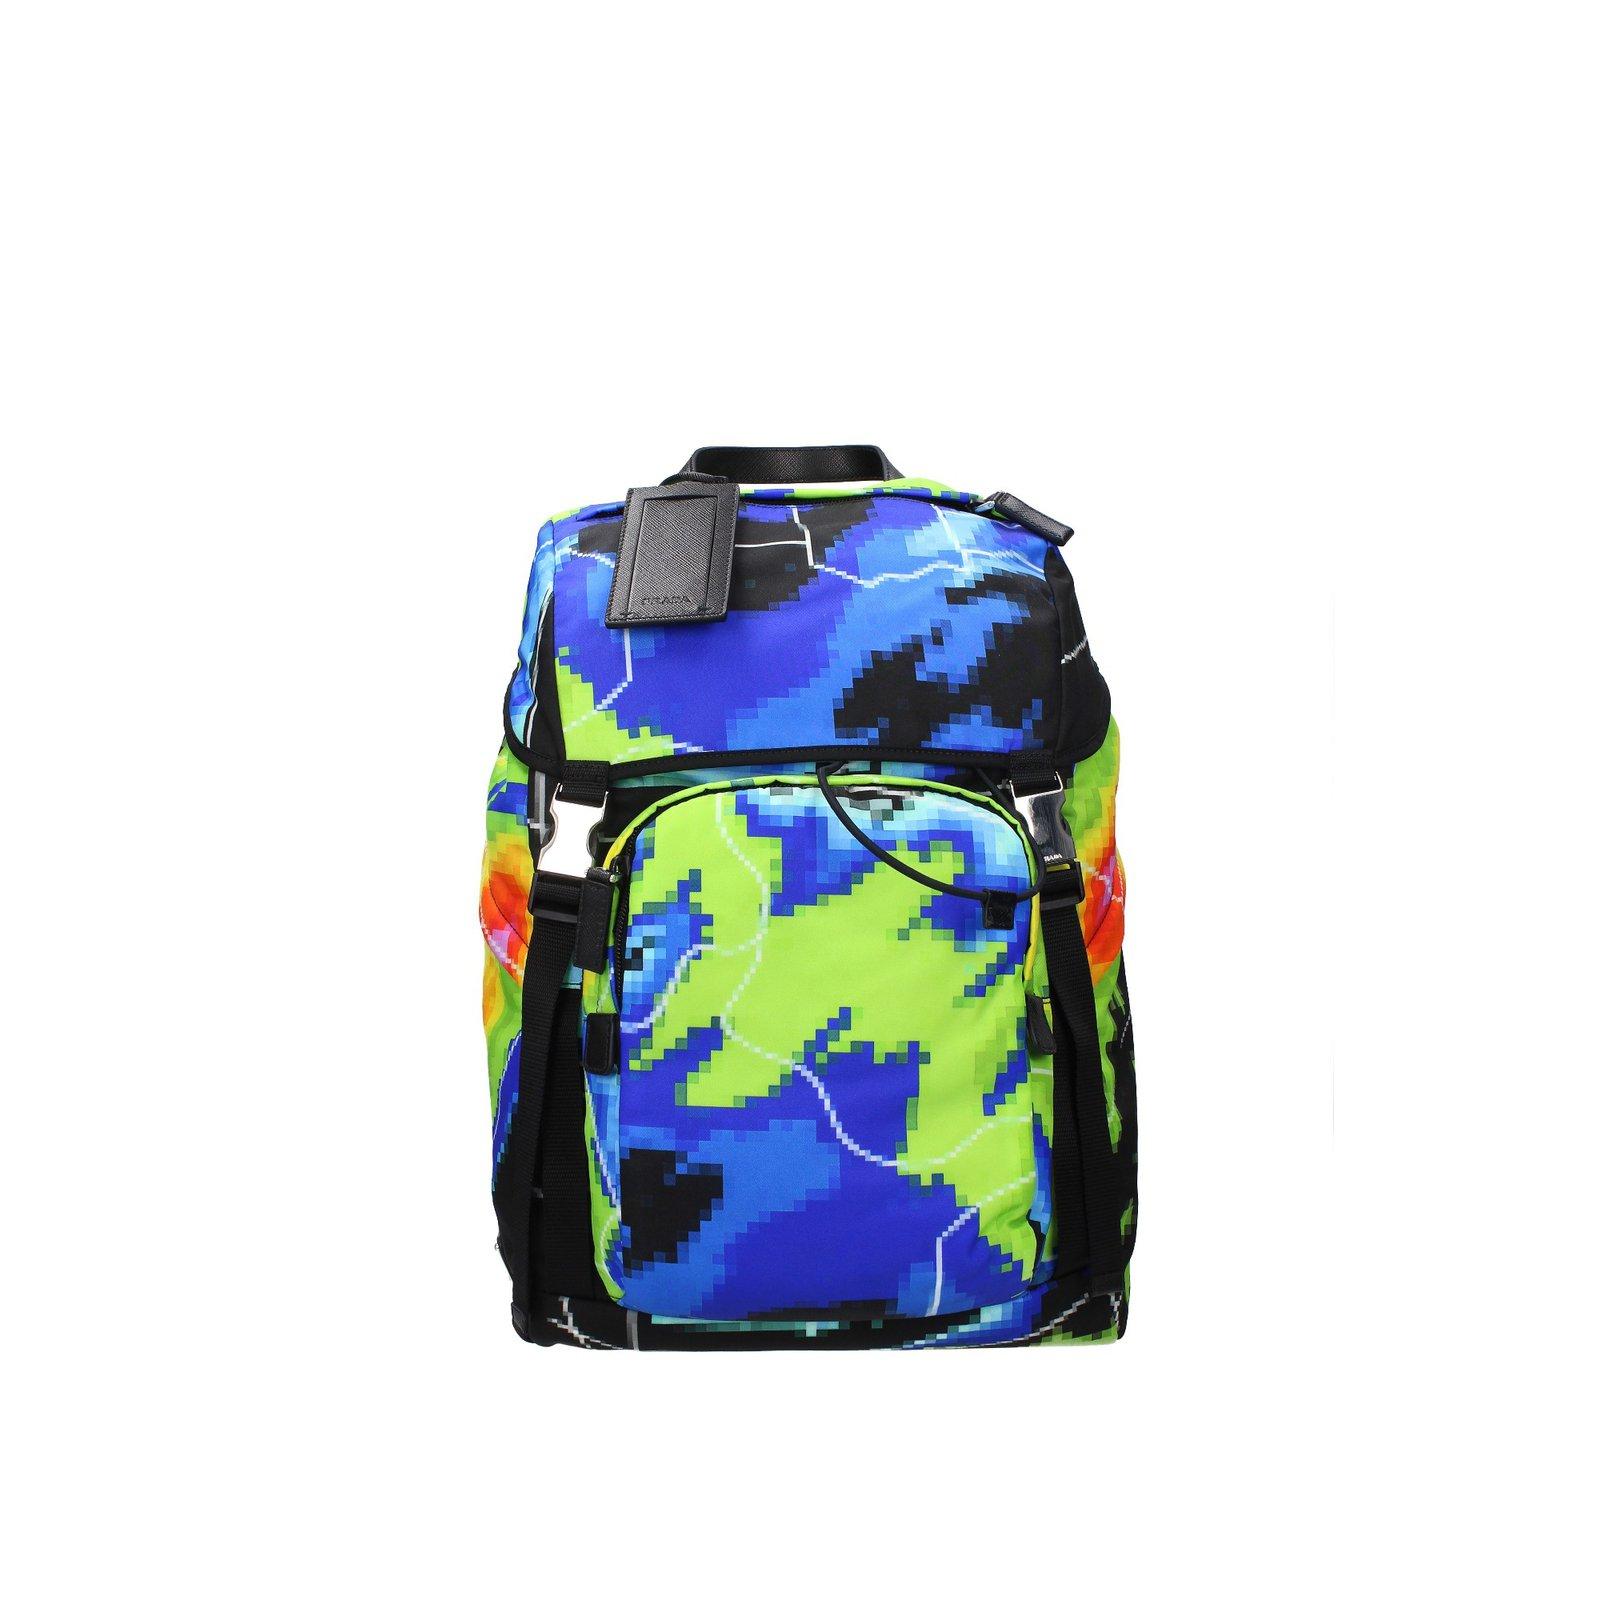 6f891f17aea0 ... coupon for prada prada backpack new backpacks nylon multiple colors  ref.57333 a8a41 d76c5